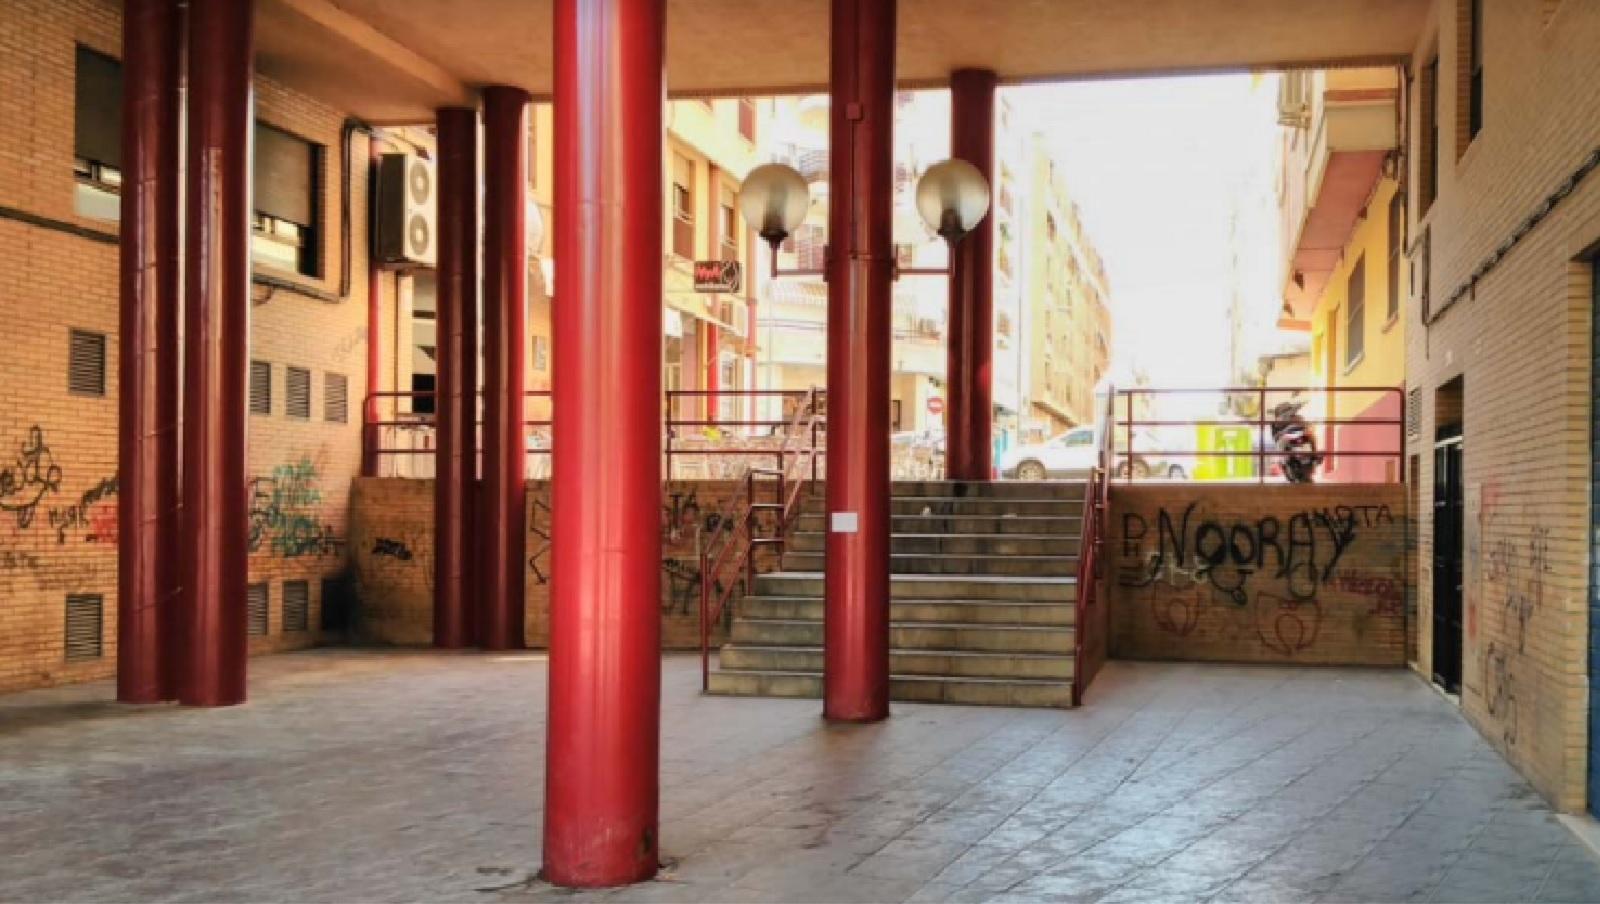 Deka ingenieria obra civil reformas edificaci n for Barreras arquitectonicas